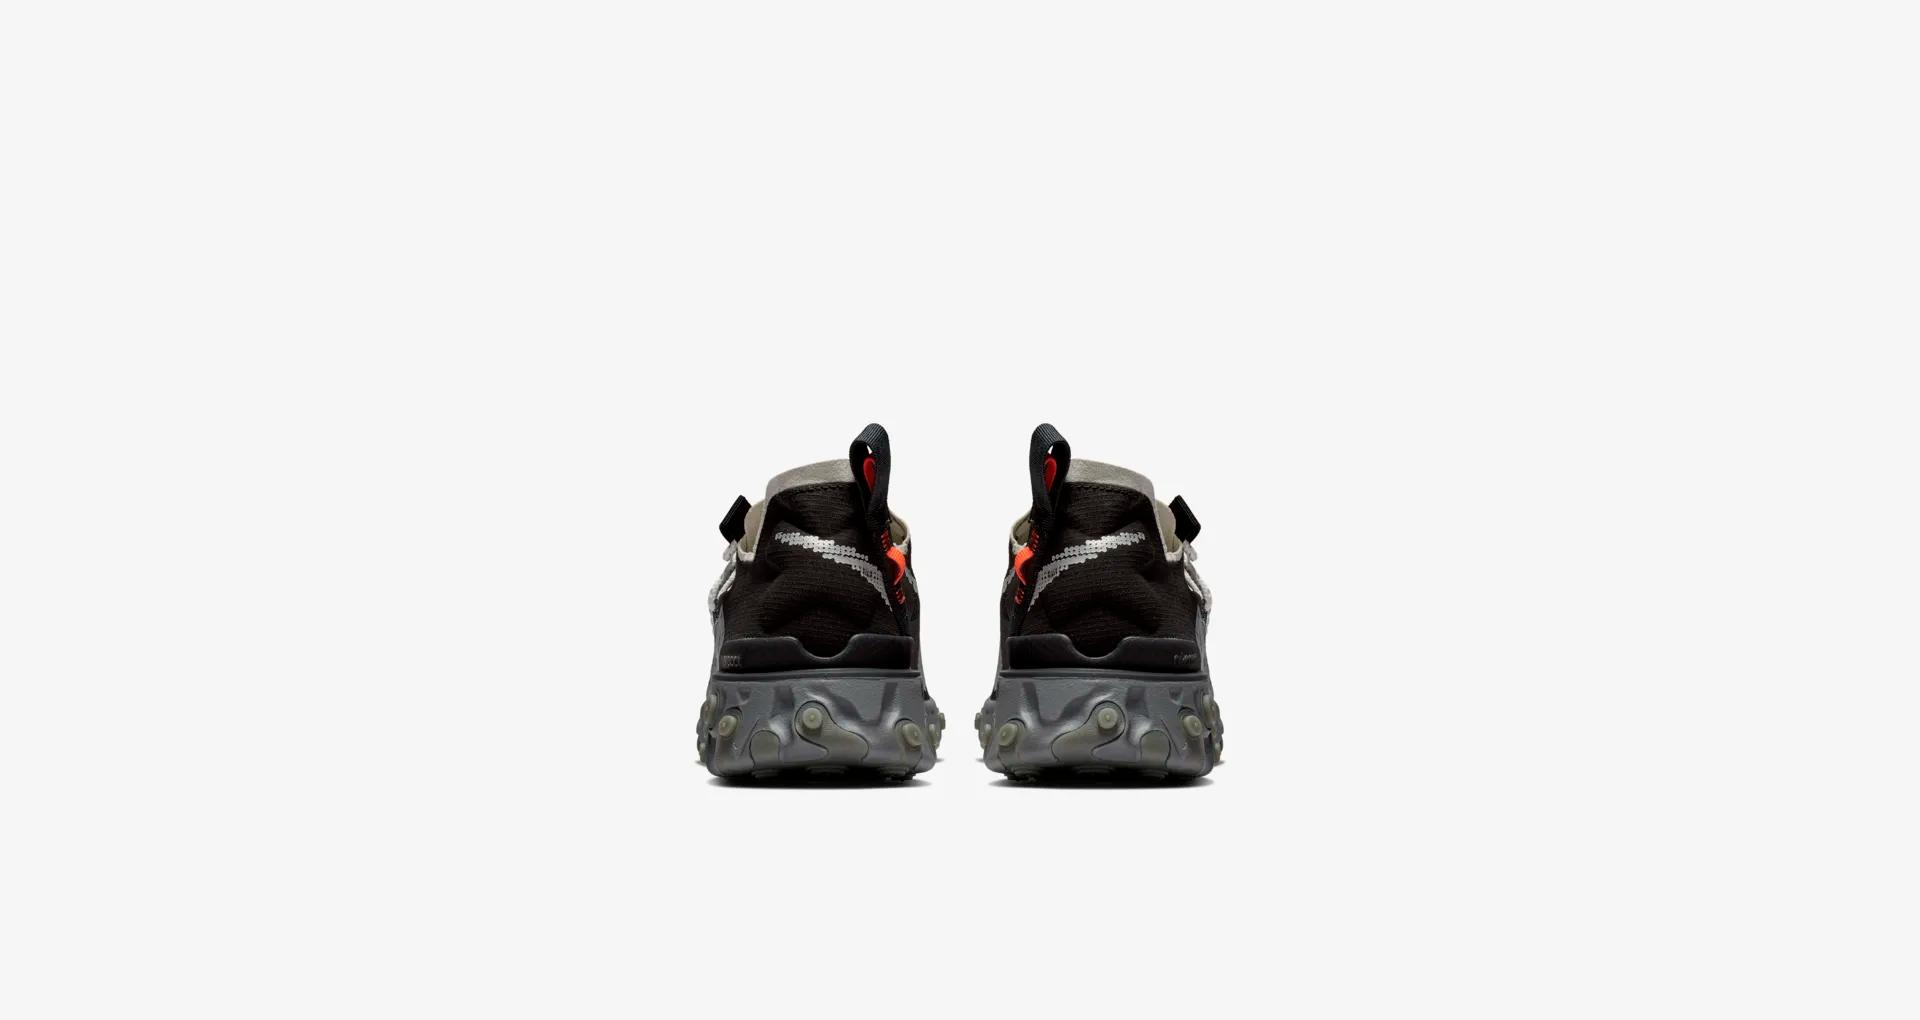 Nike React Runner WR ISPA Black 5